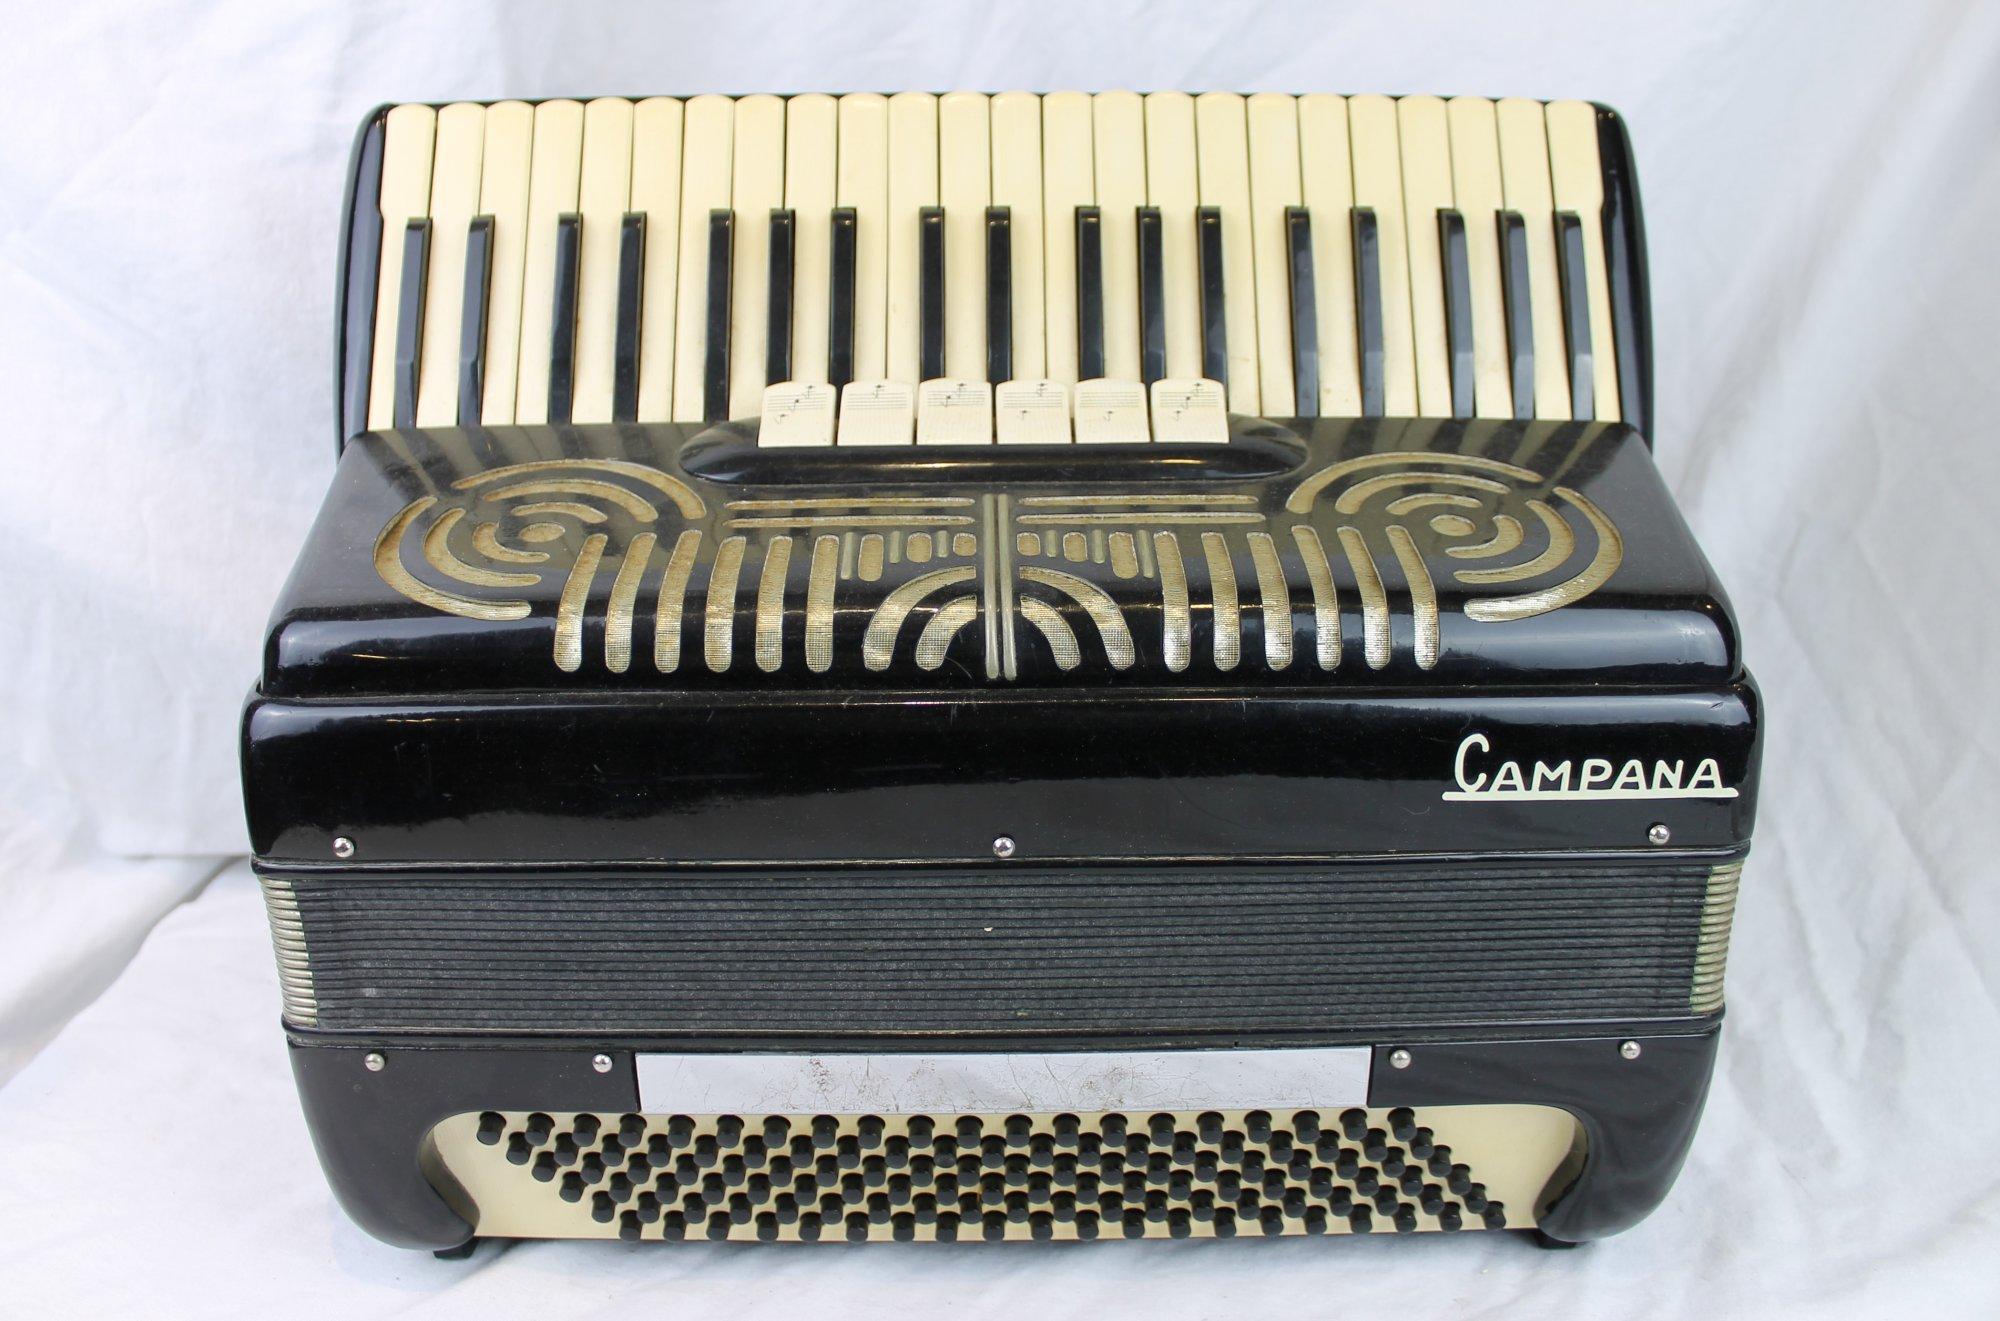 4578 - Black Campana Piano Accordion LMH 41 120